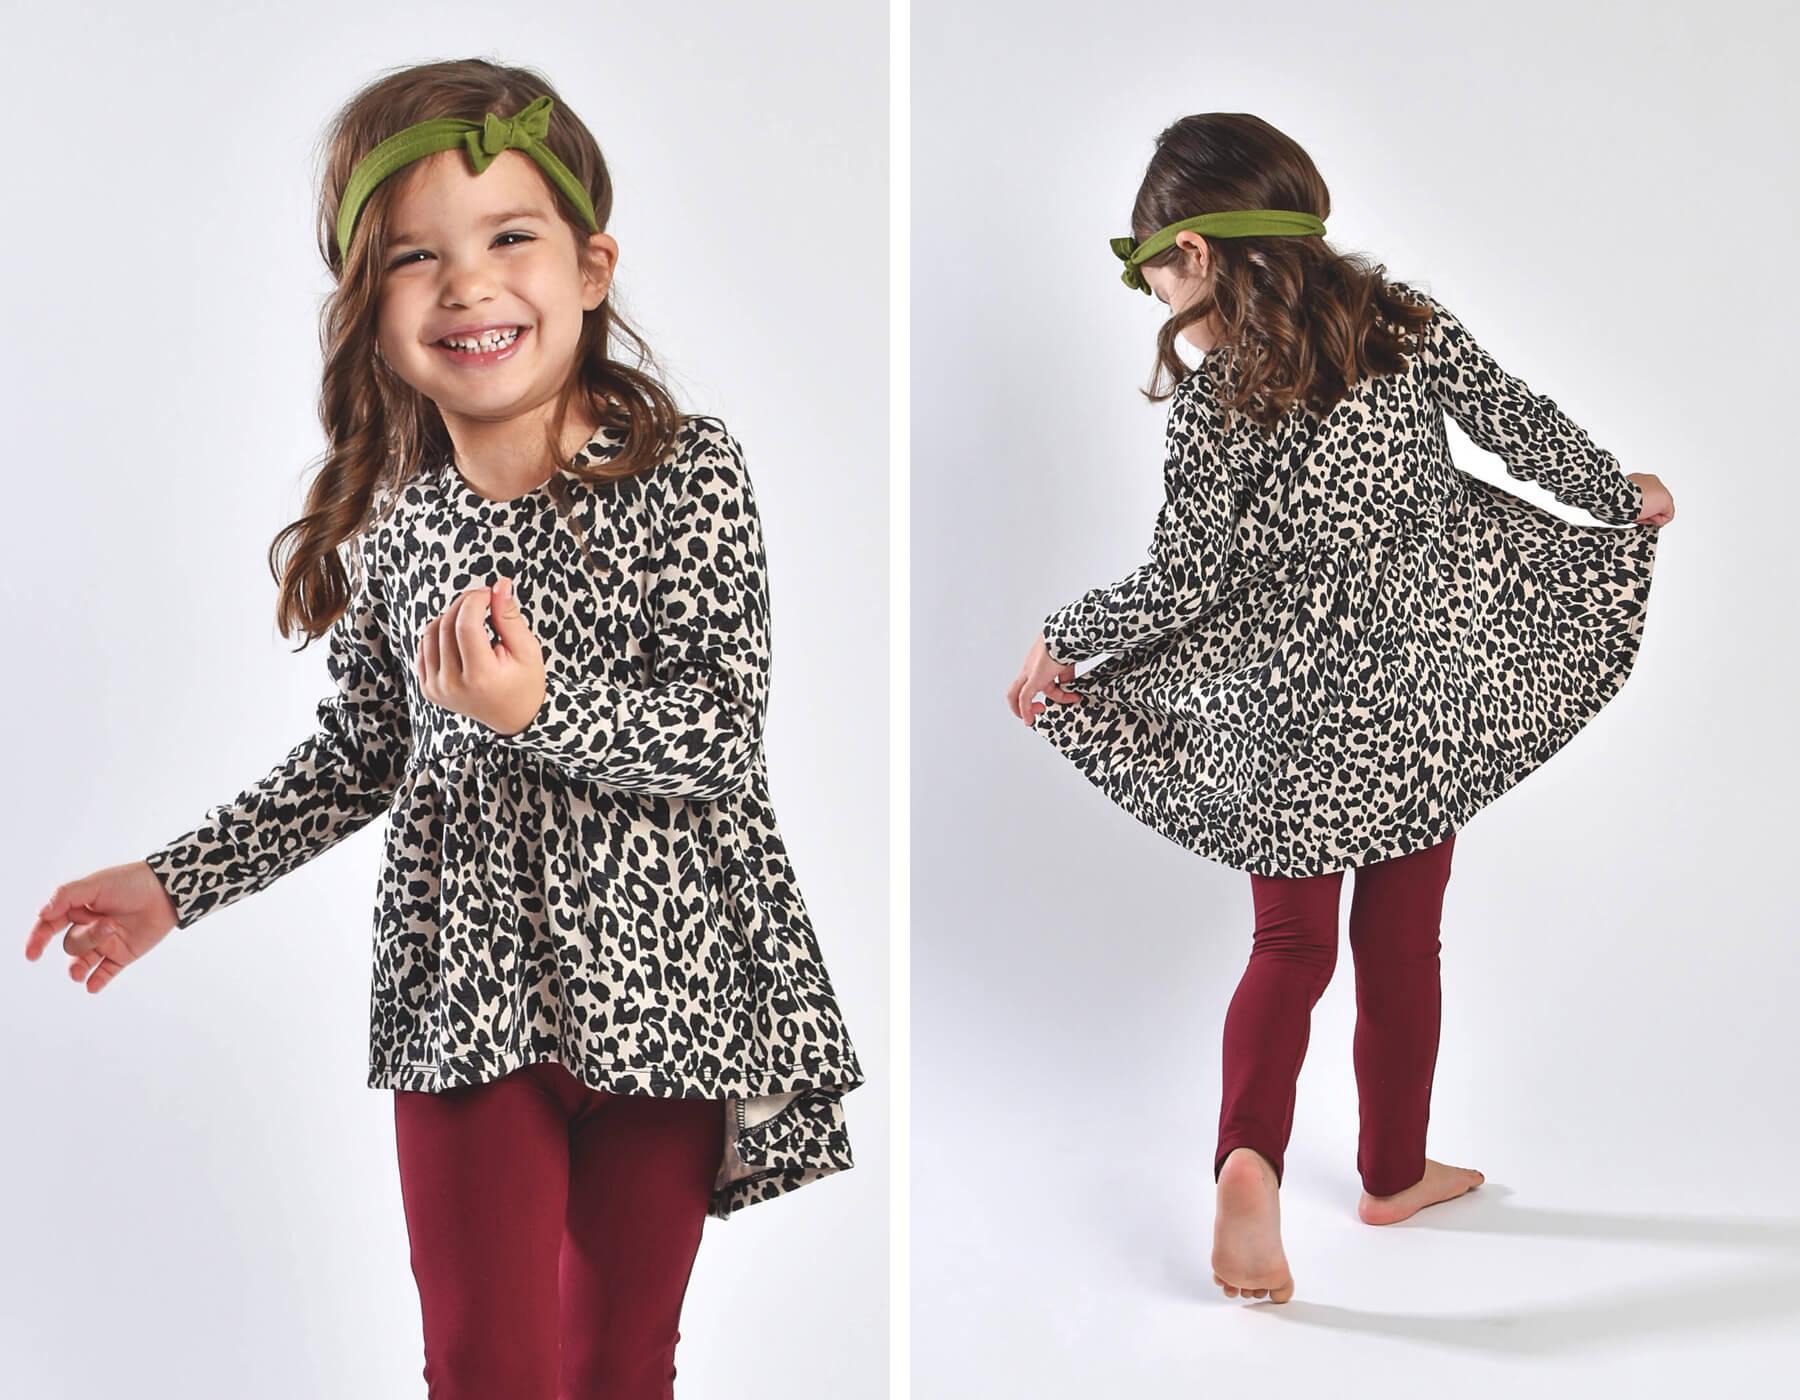 hilo-top-leopard-leggins-burgundy-briabay